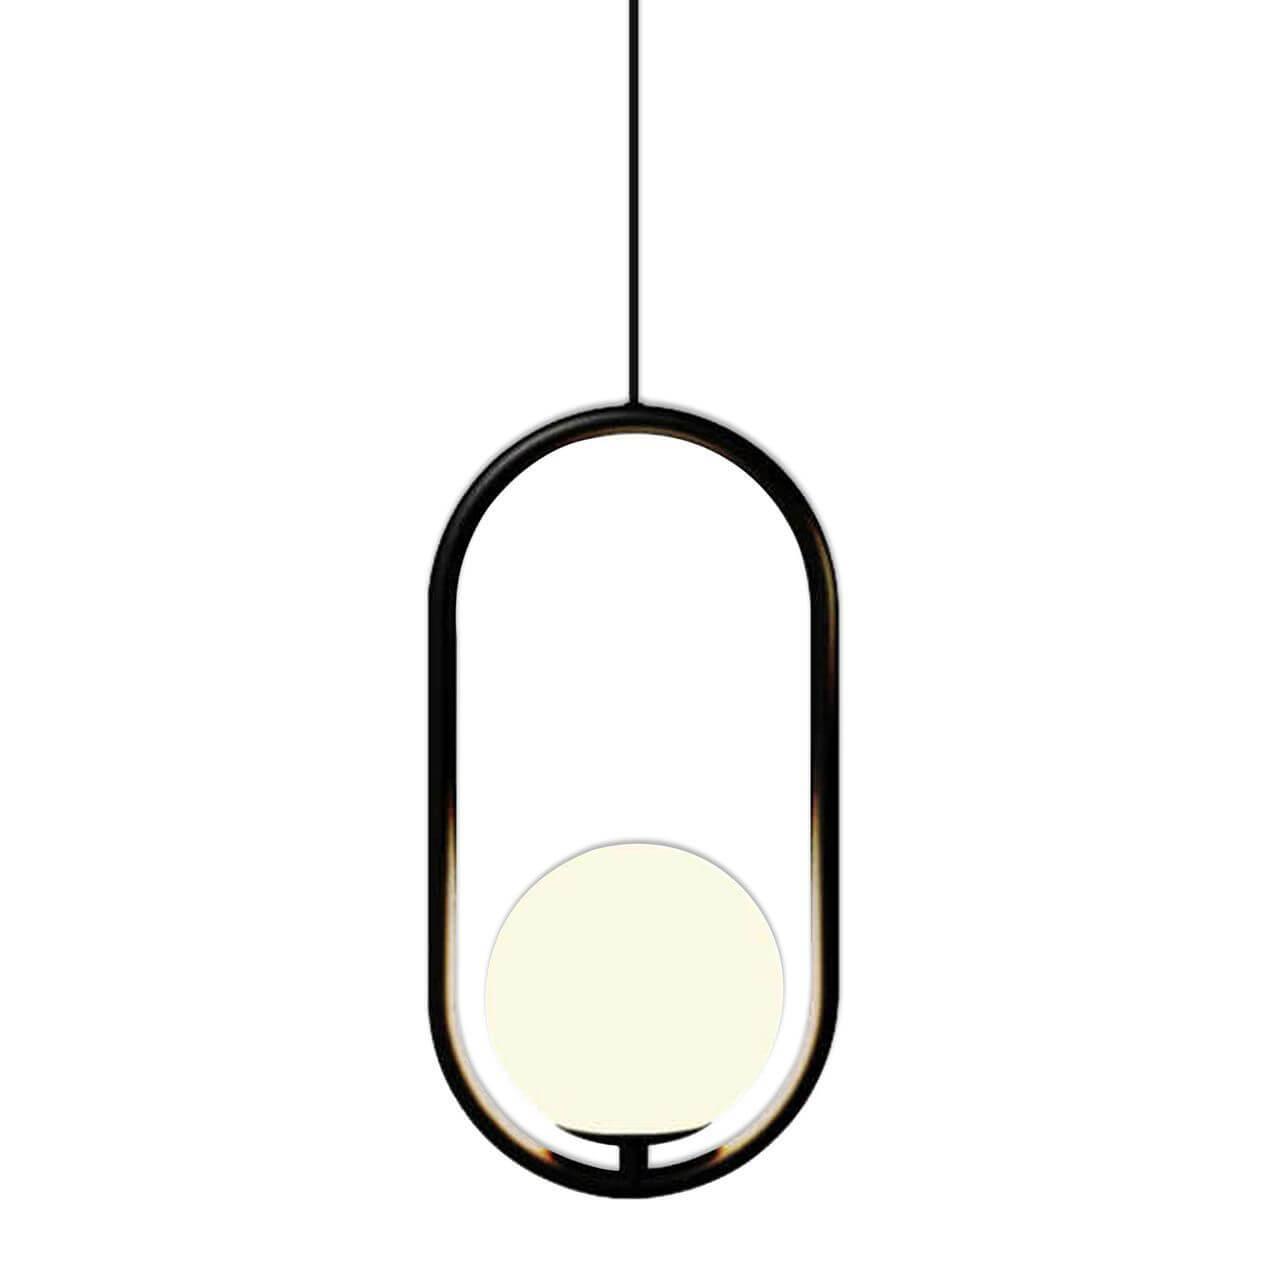 цена на Светильник Kink Light 07631-1A,19 Кенти